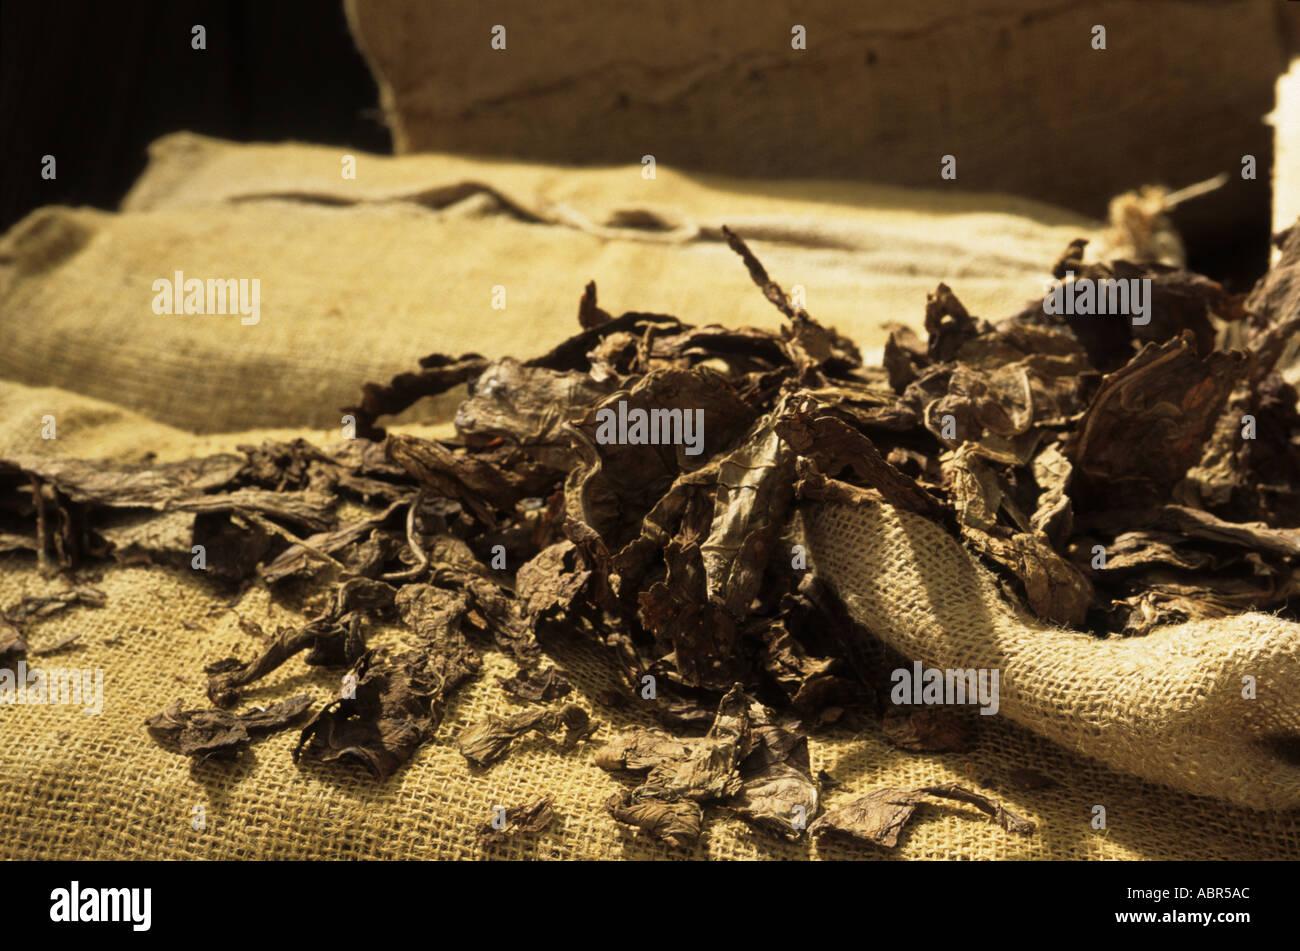 Cachoeira, Bahia State, Brazil. Shreds of tobacco on hessian sacking; Dannemann cigar factory. - Stock Image